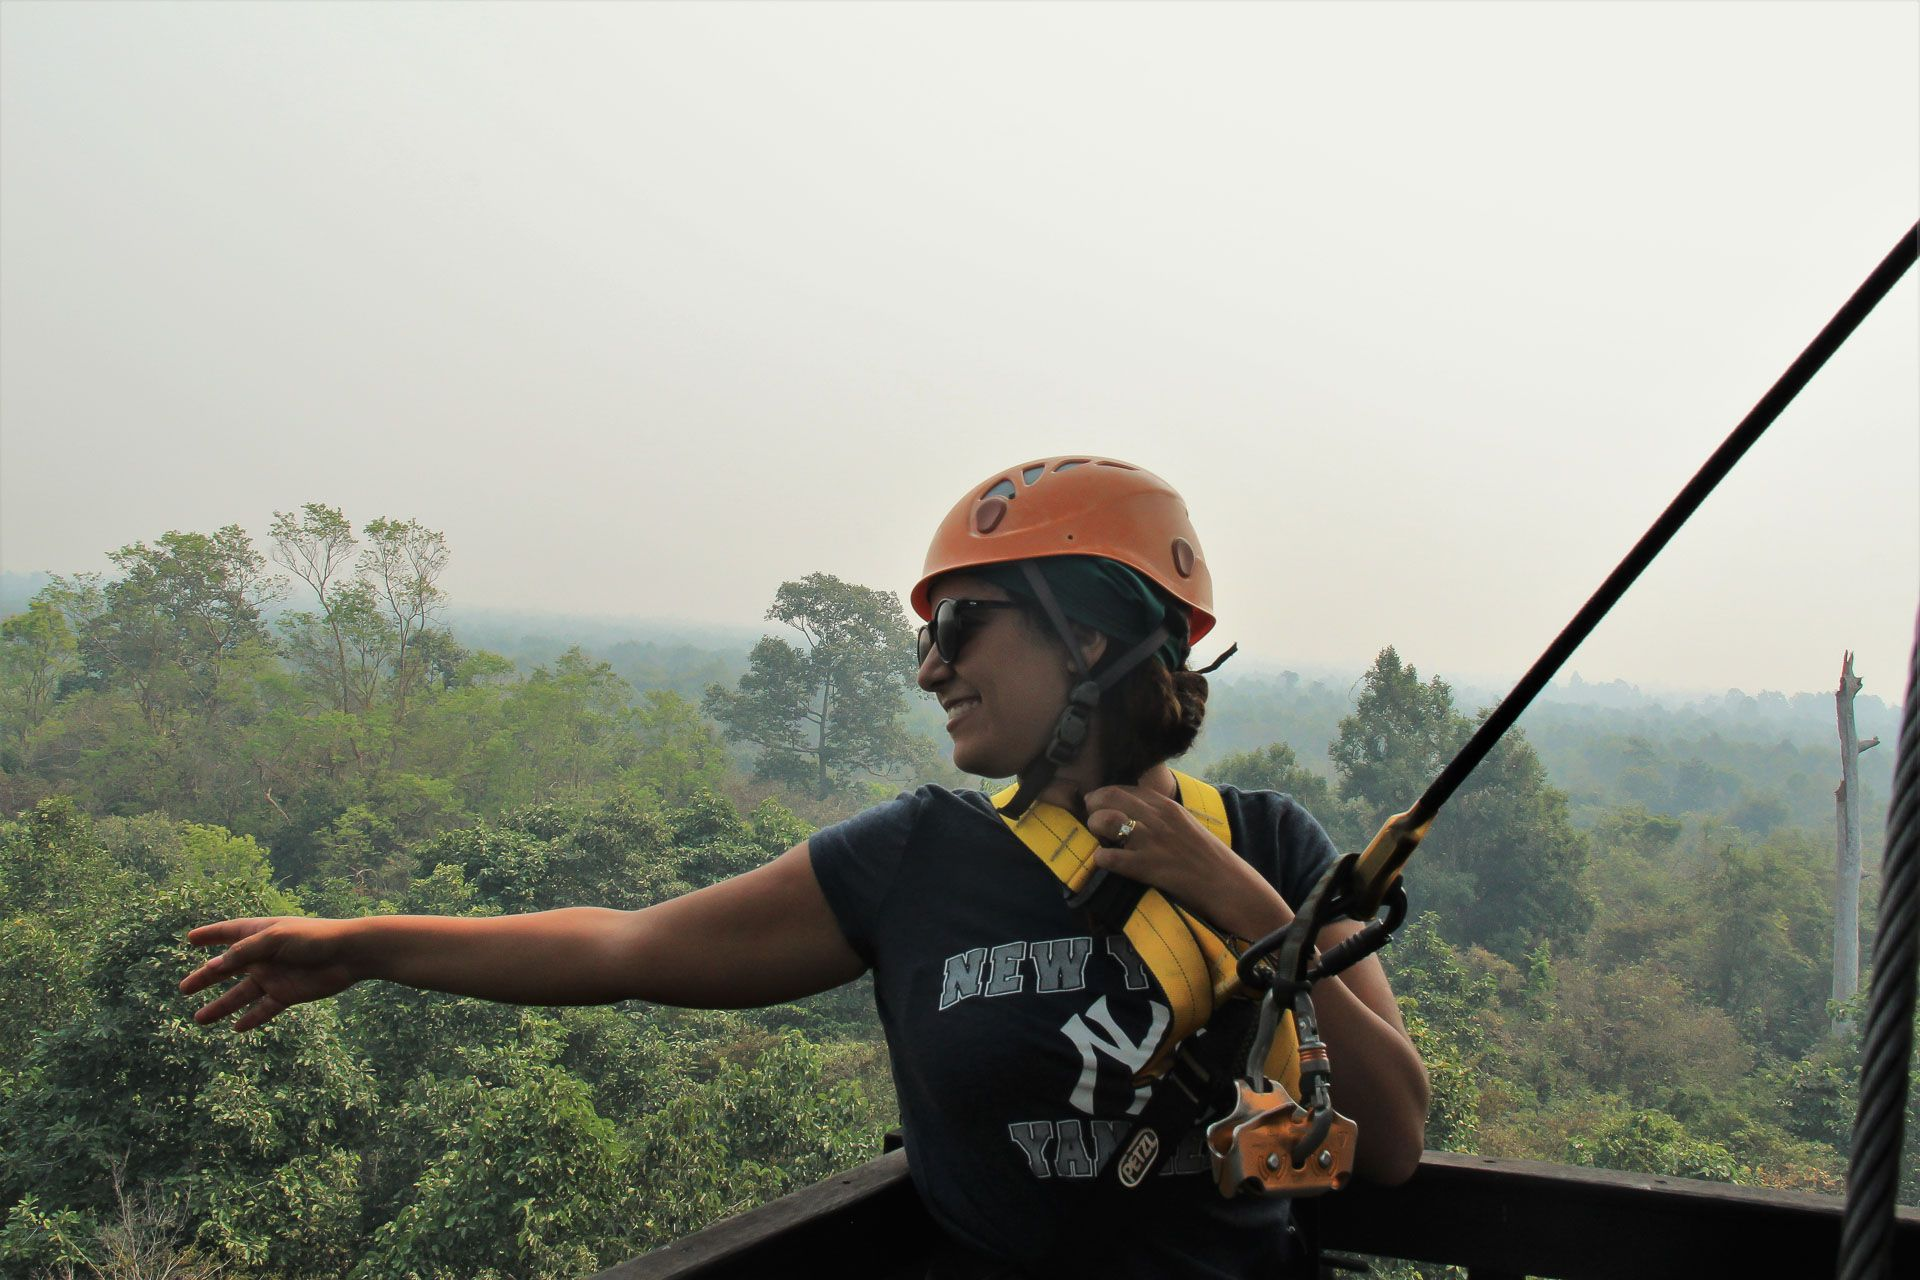 Lesvoyageuses-teste-par-les-voyageuses-tyrolienne-siem-reap-cambodge-angkor-zipline-7